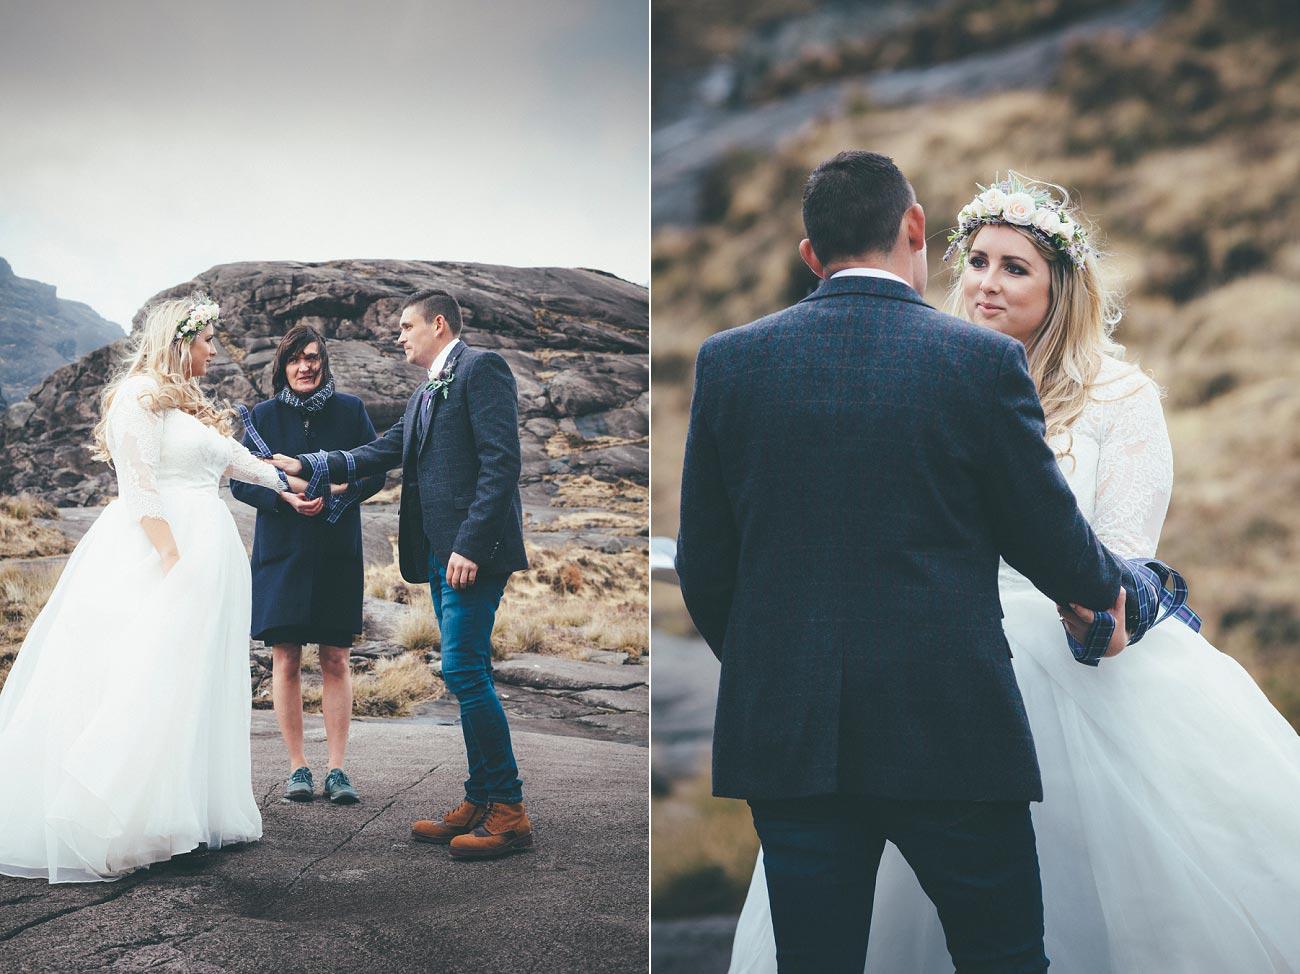 isle of skye wedding loch coruisk small outdoor wedding photography scotland scottish highlands photographer 0036